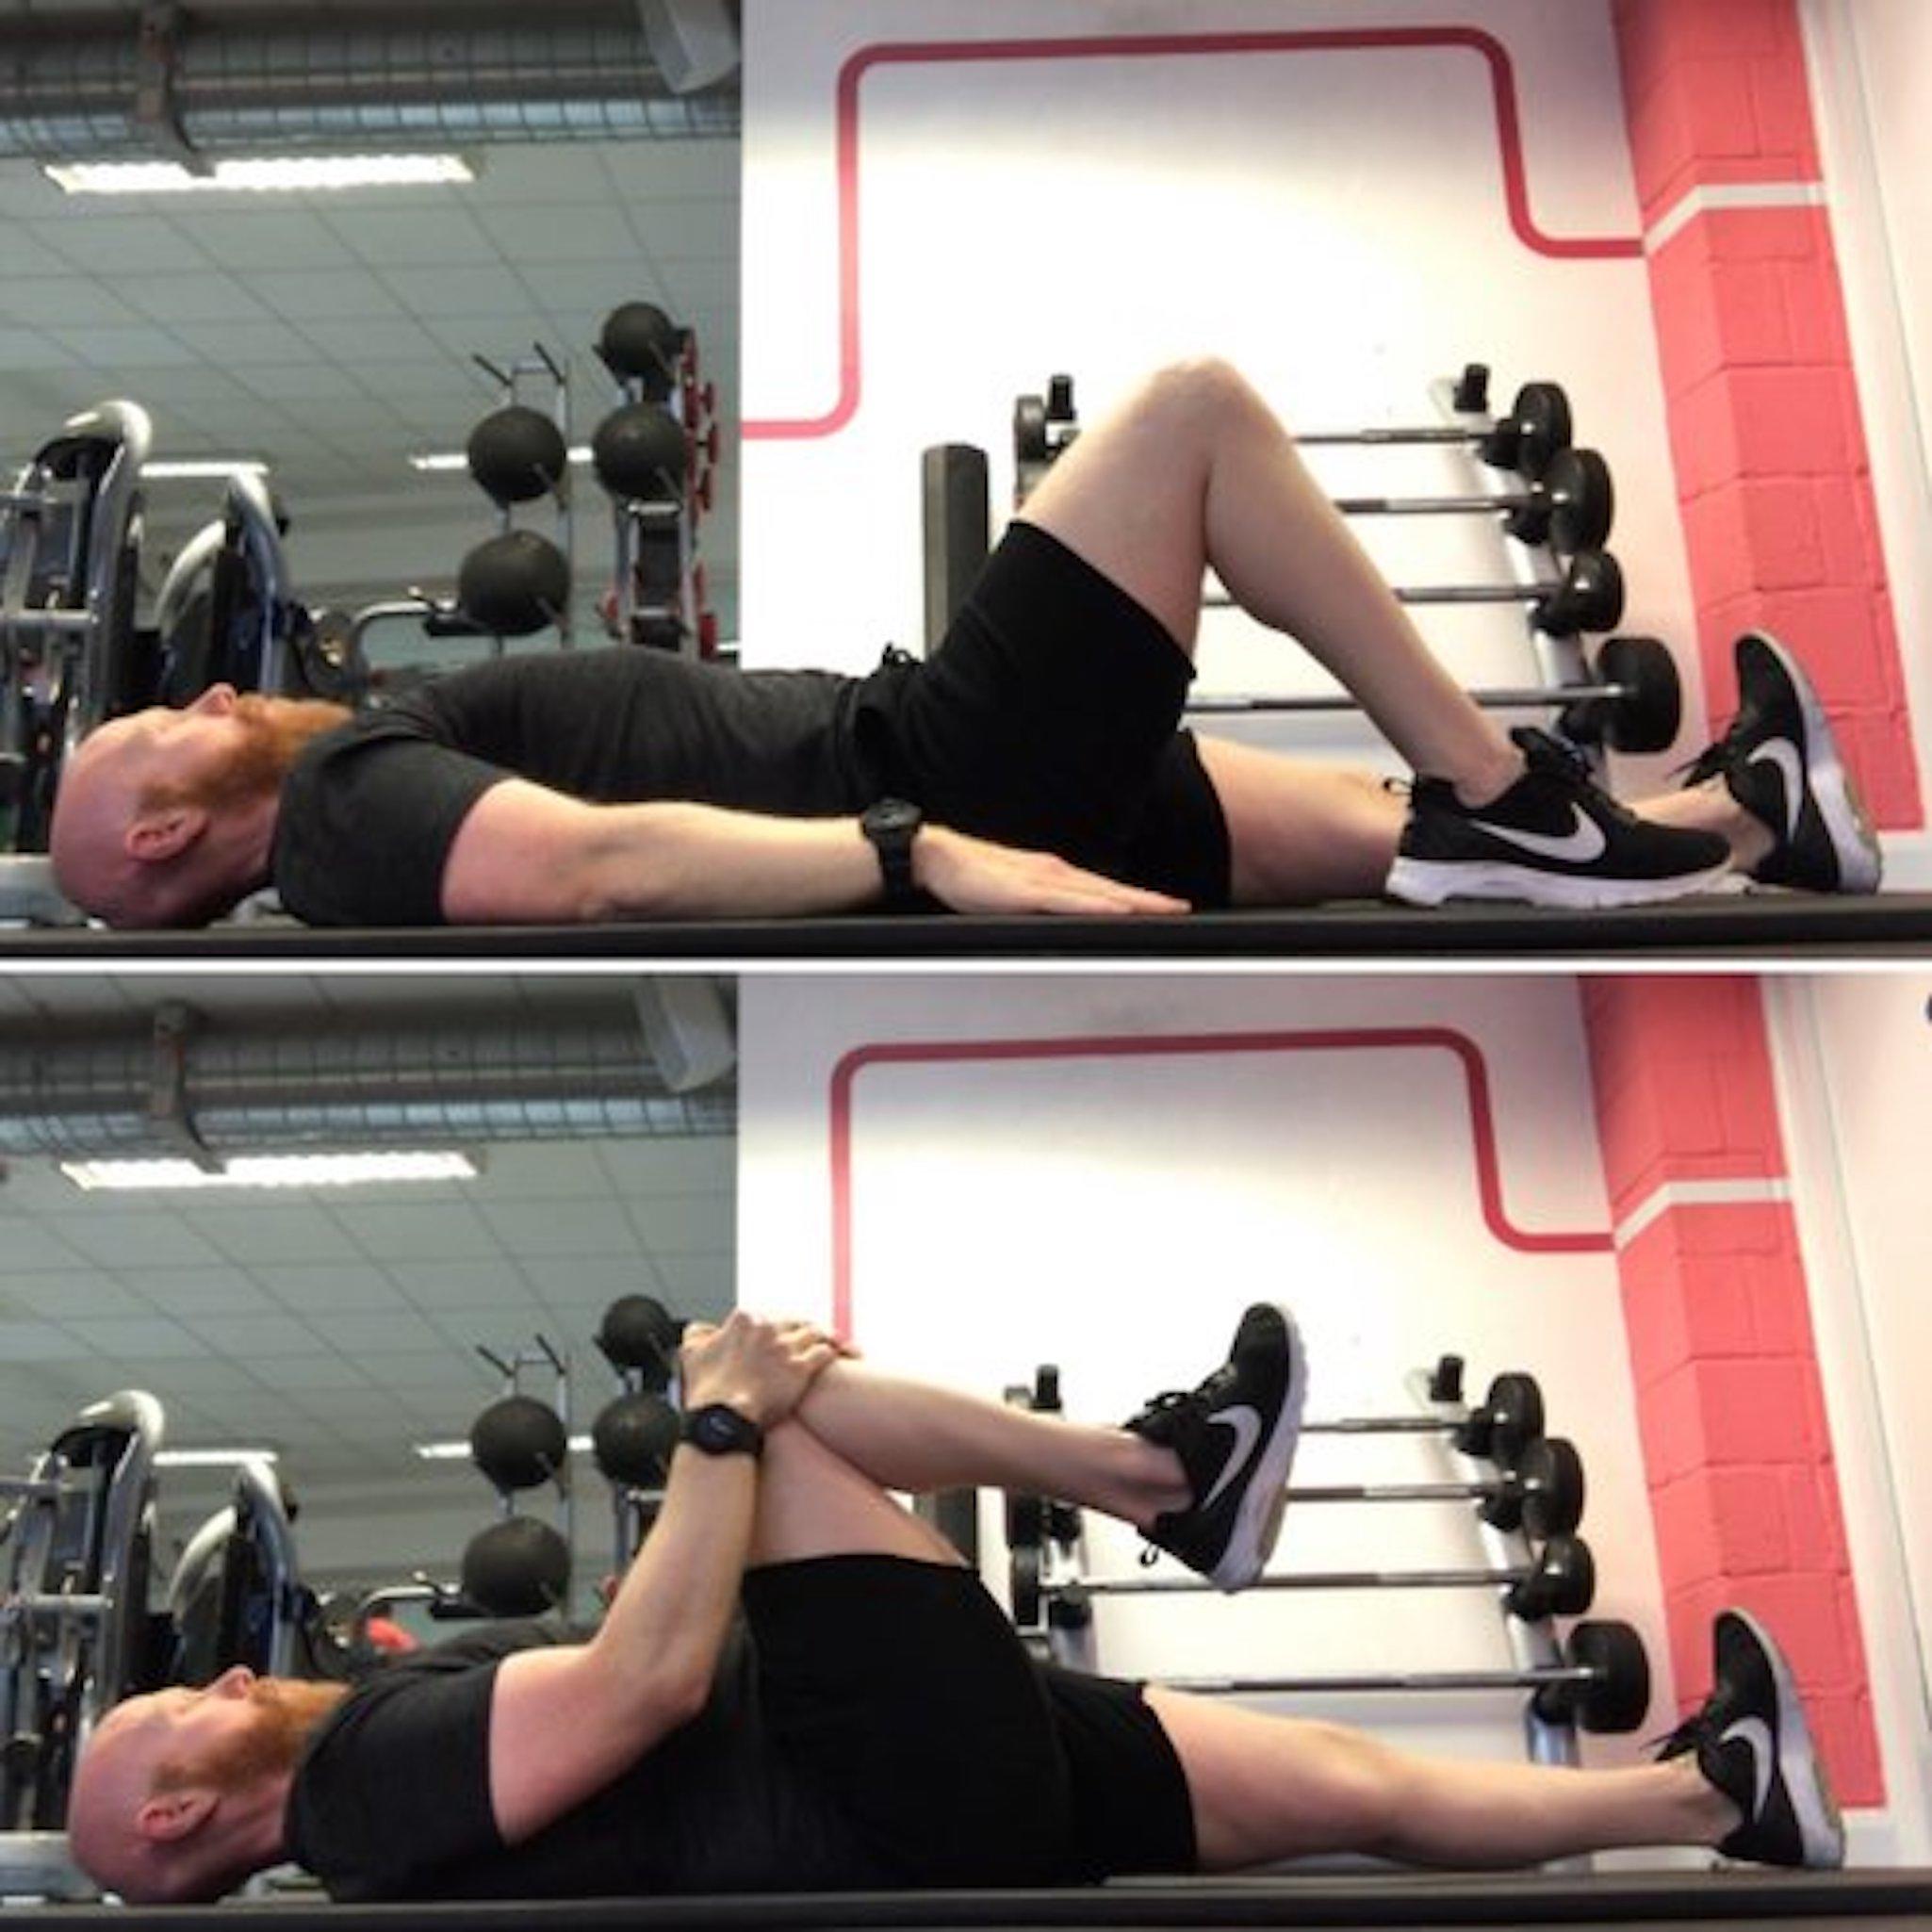 Supine+hip+stretch+Three+Pillars+of+Fitness.JPG